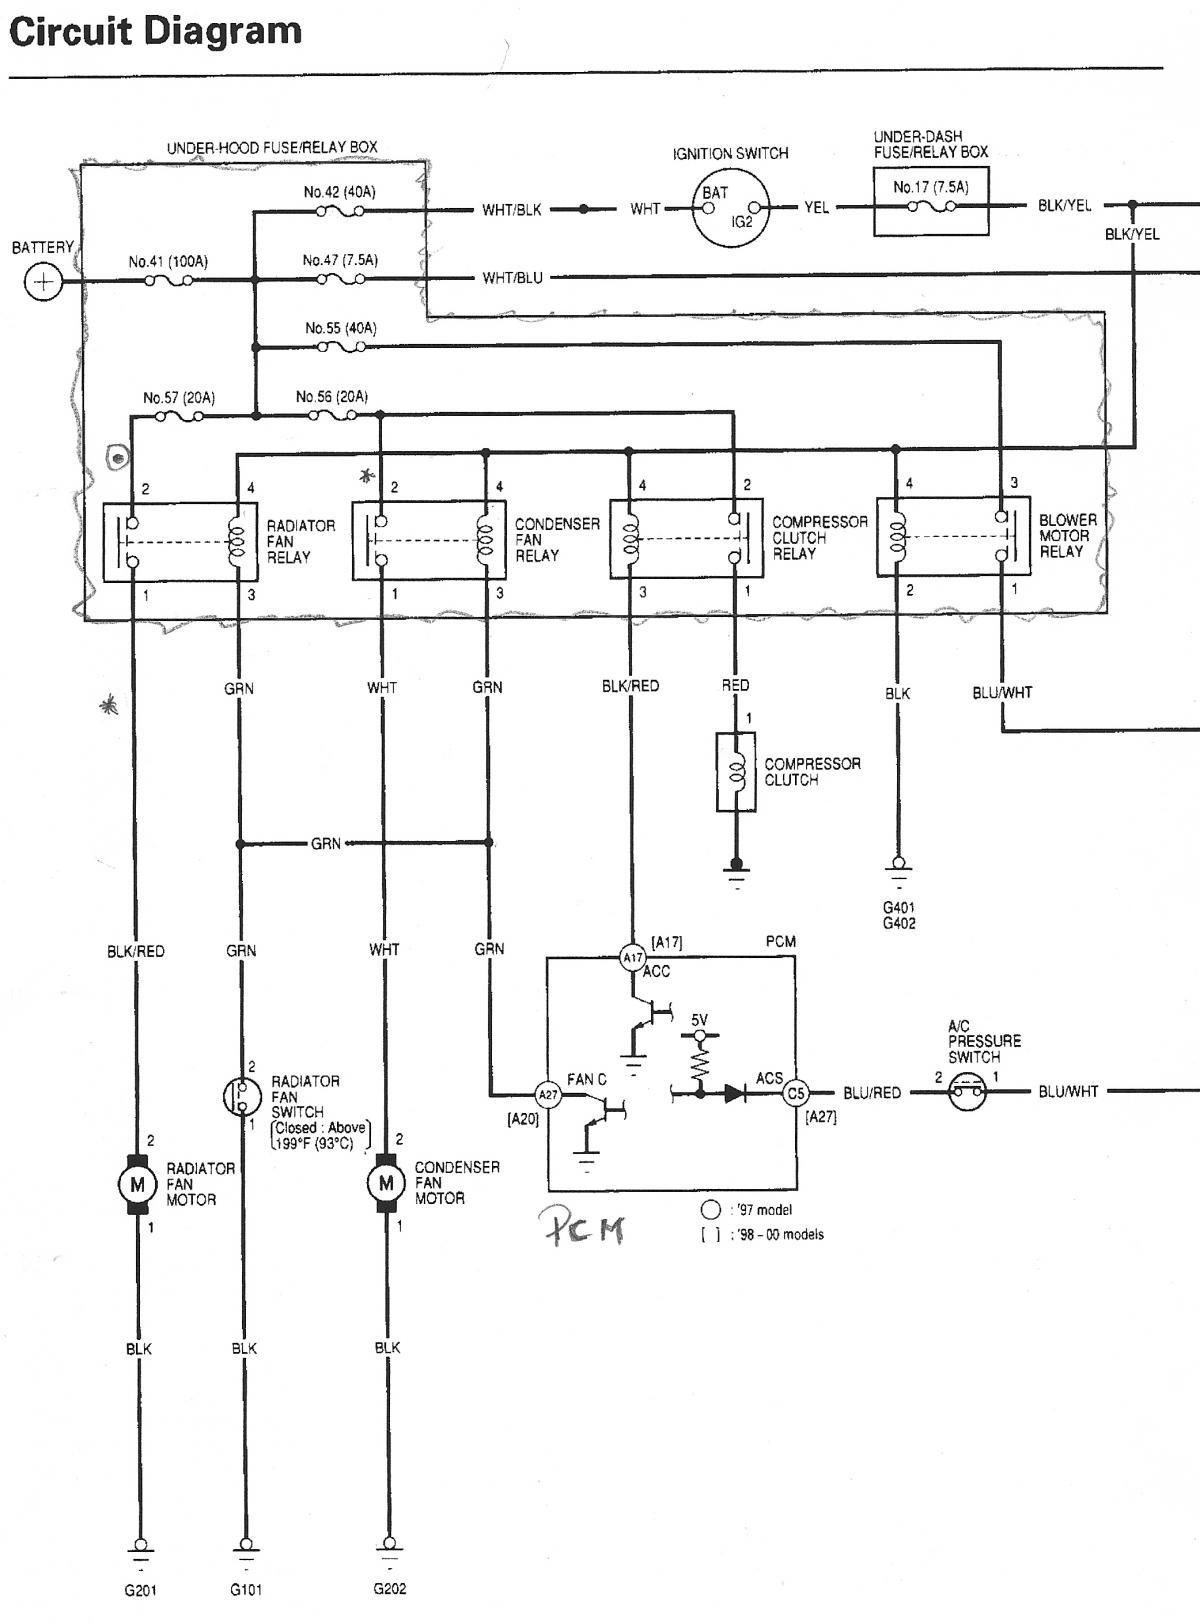 99 Civic Engine Diagram Honda Cr V Radio Wiring Diagram Additionally 2007 Honda Cr V Radio Of 99 Civic Engine Diagram